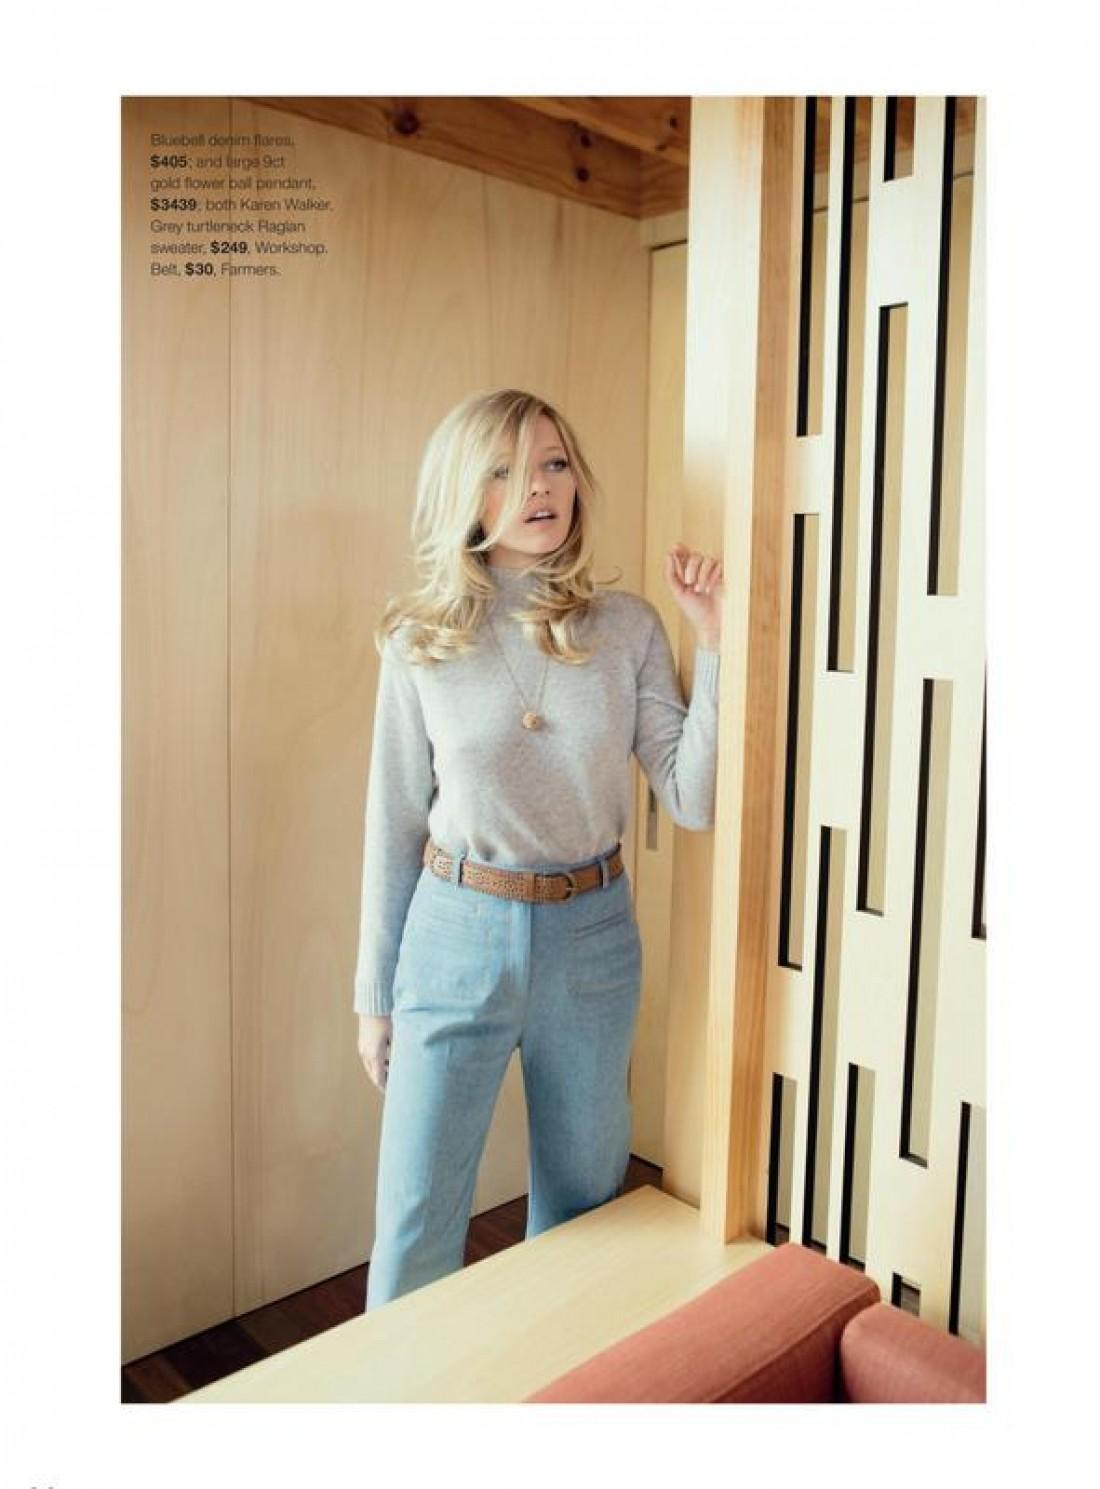 Zippora for Next Magazine, shot by Olivia Hemus, styled by Sonia Greenslade